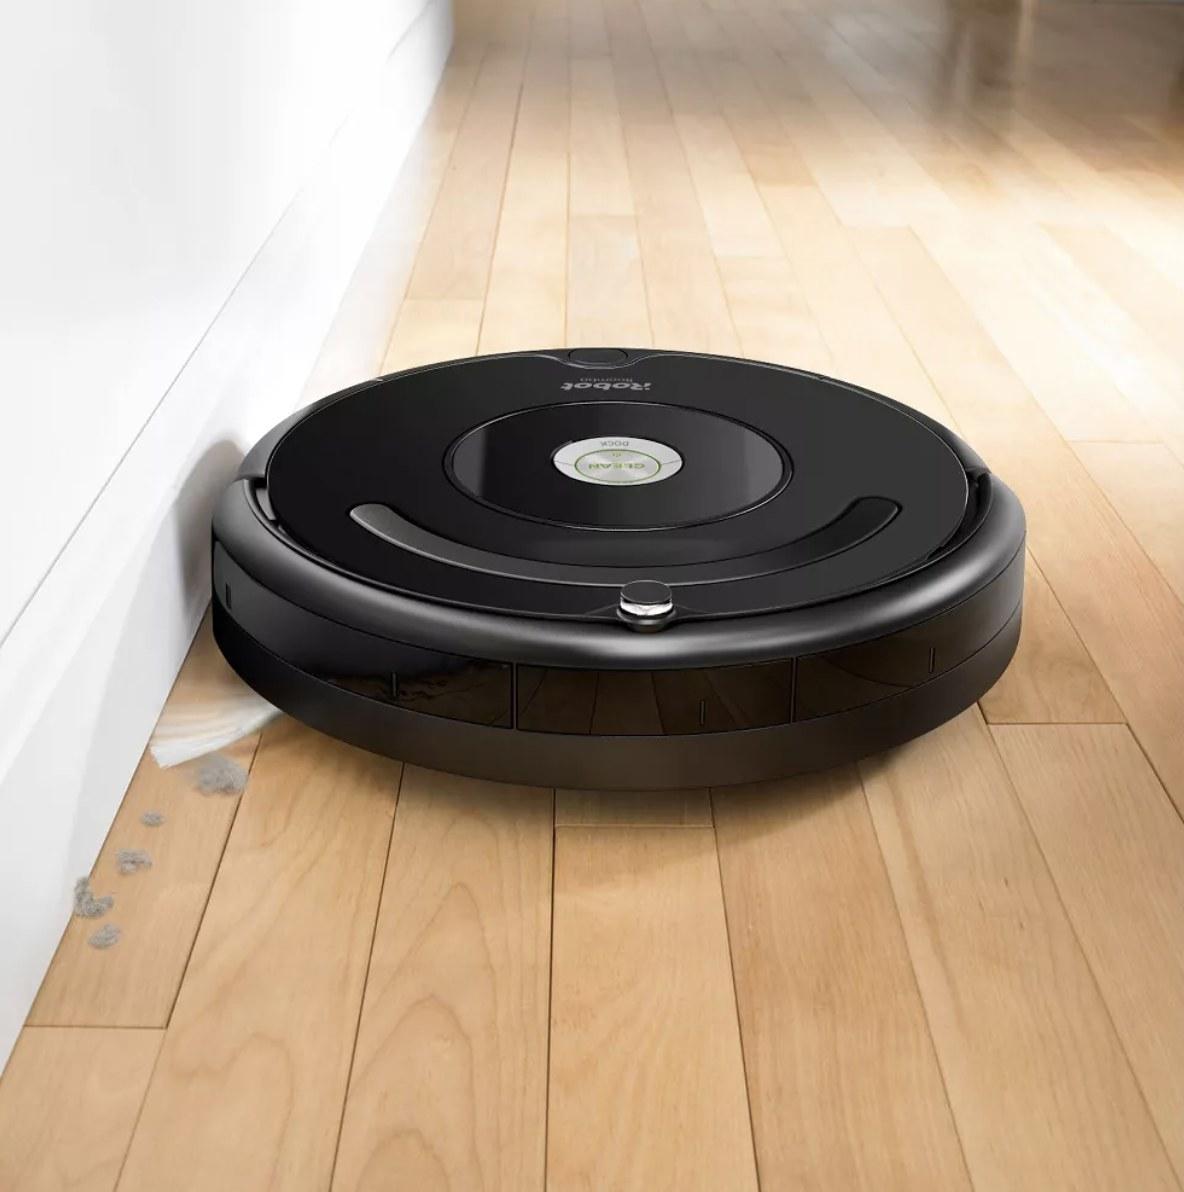 the roomba vacuum cleaning hardwood floors